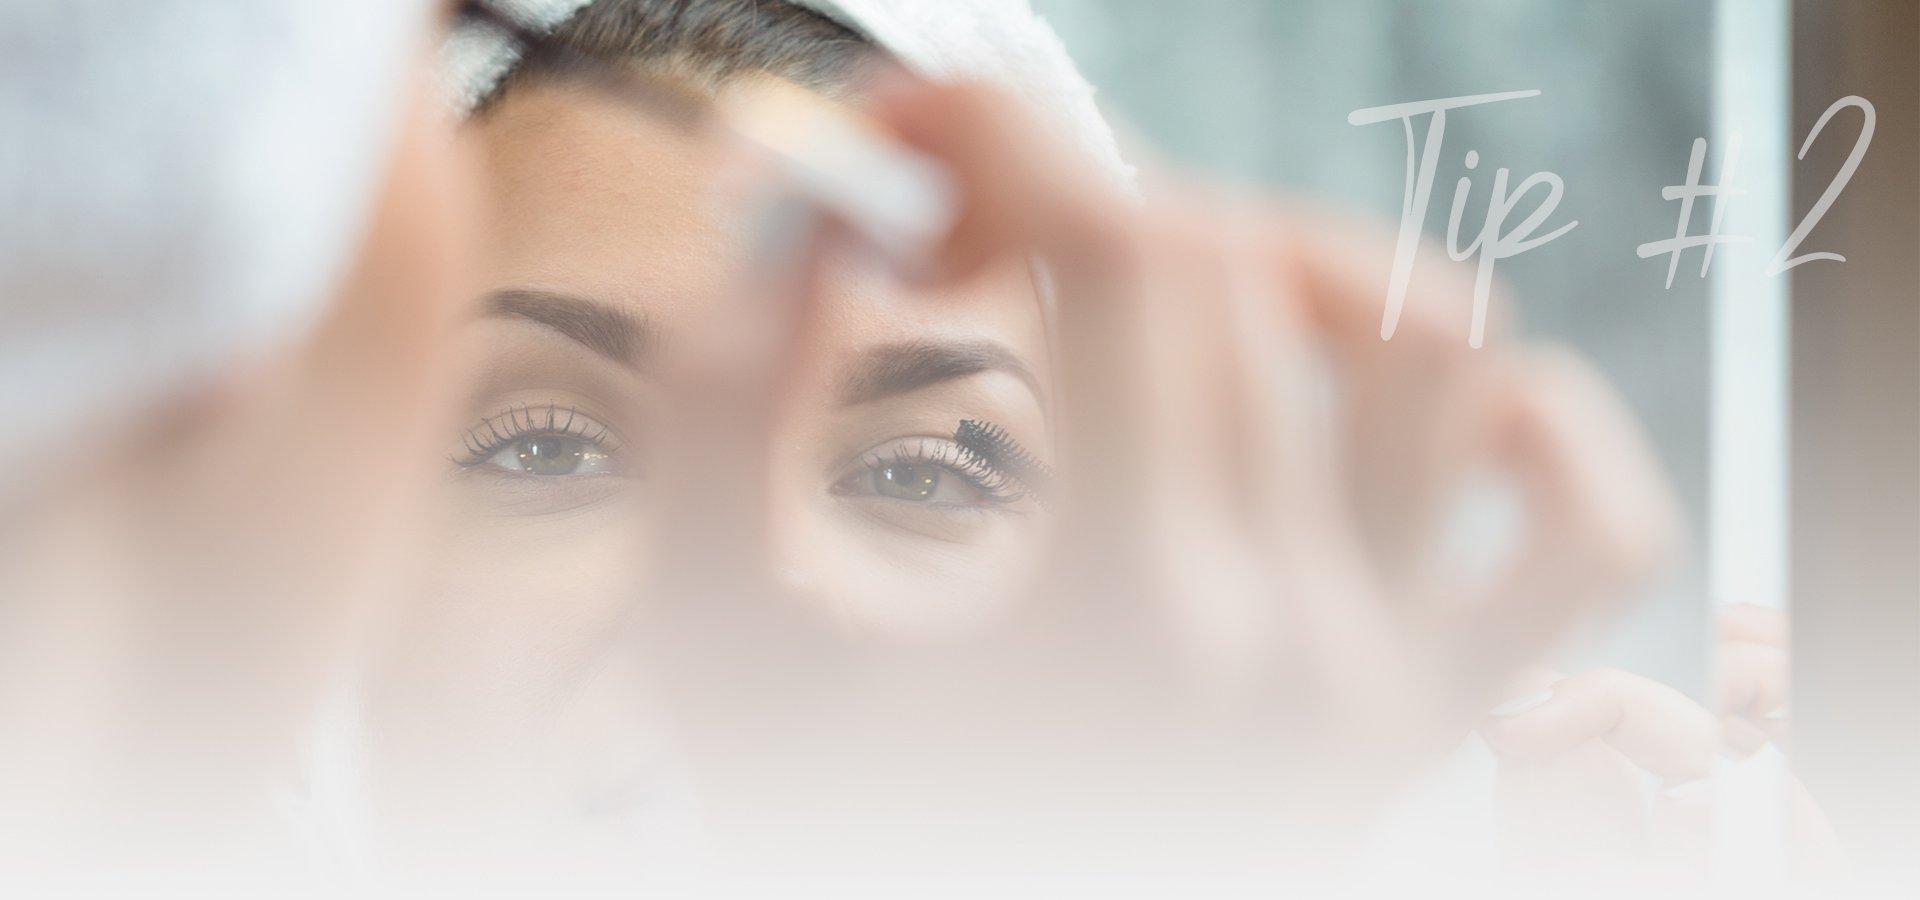 Woman putting on make-up